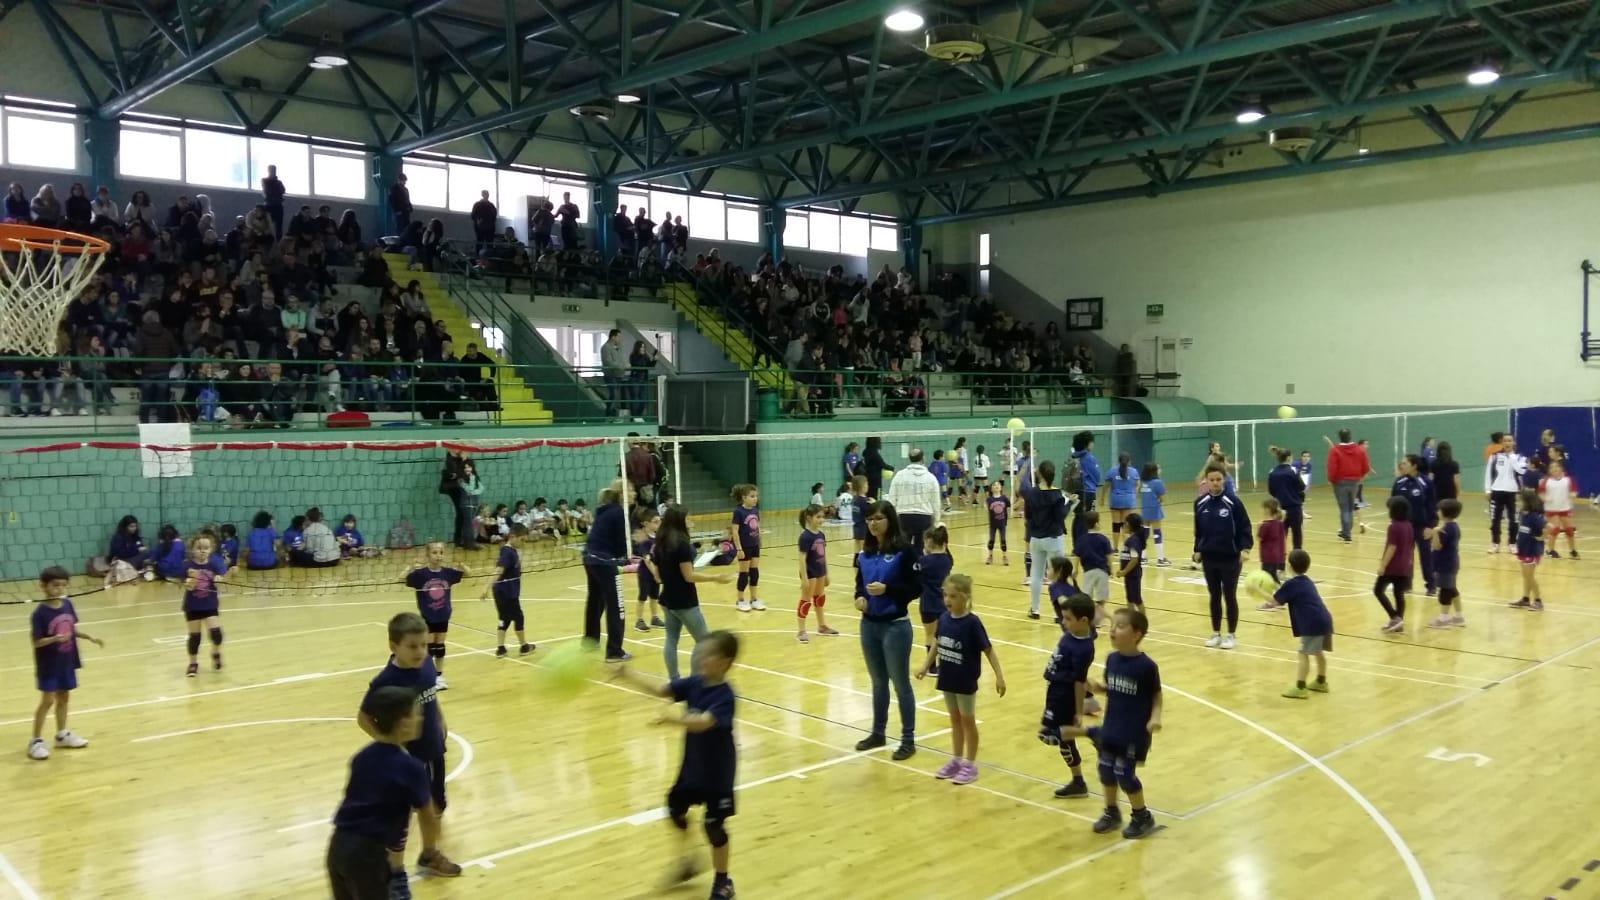 memorial rosso sport and go sampierdarena (1)